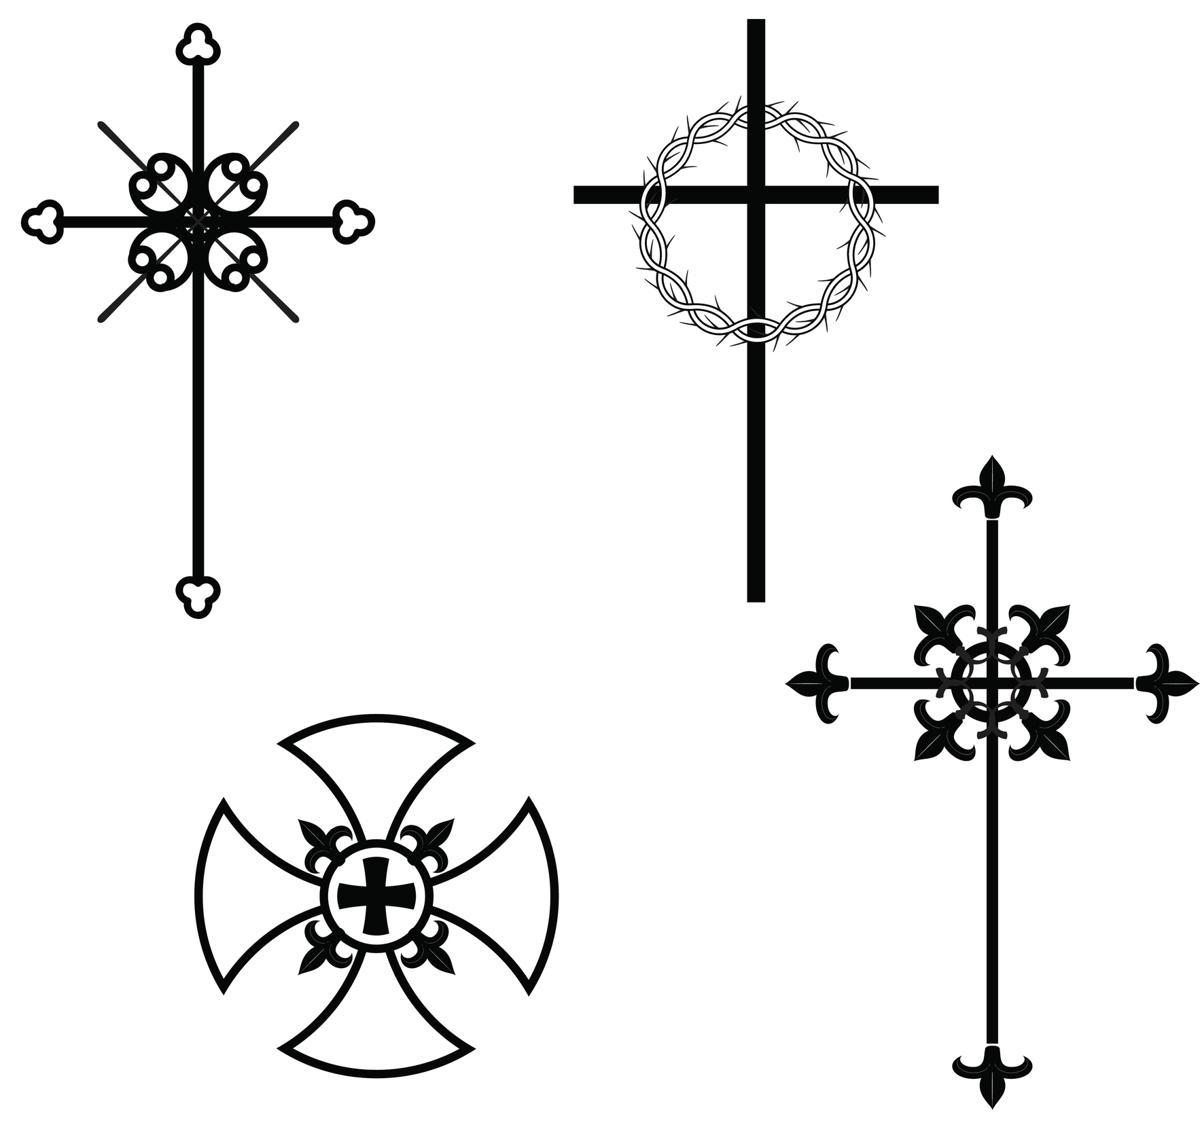 Gaelic symbols their meanings images symbol and sign ideas celtic armband tattoos cross tattoo illustration buycottarizona buycottarizona